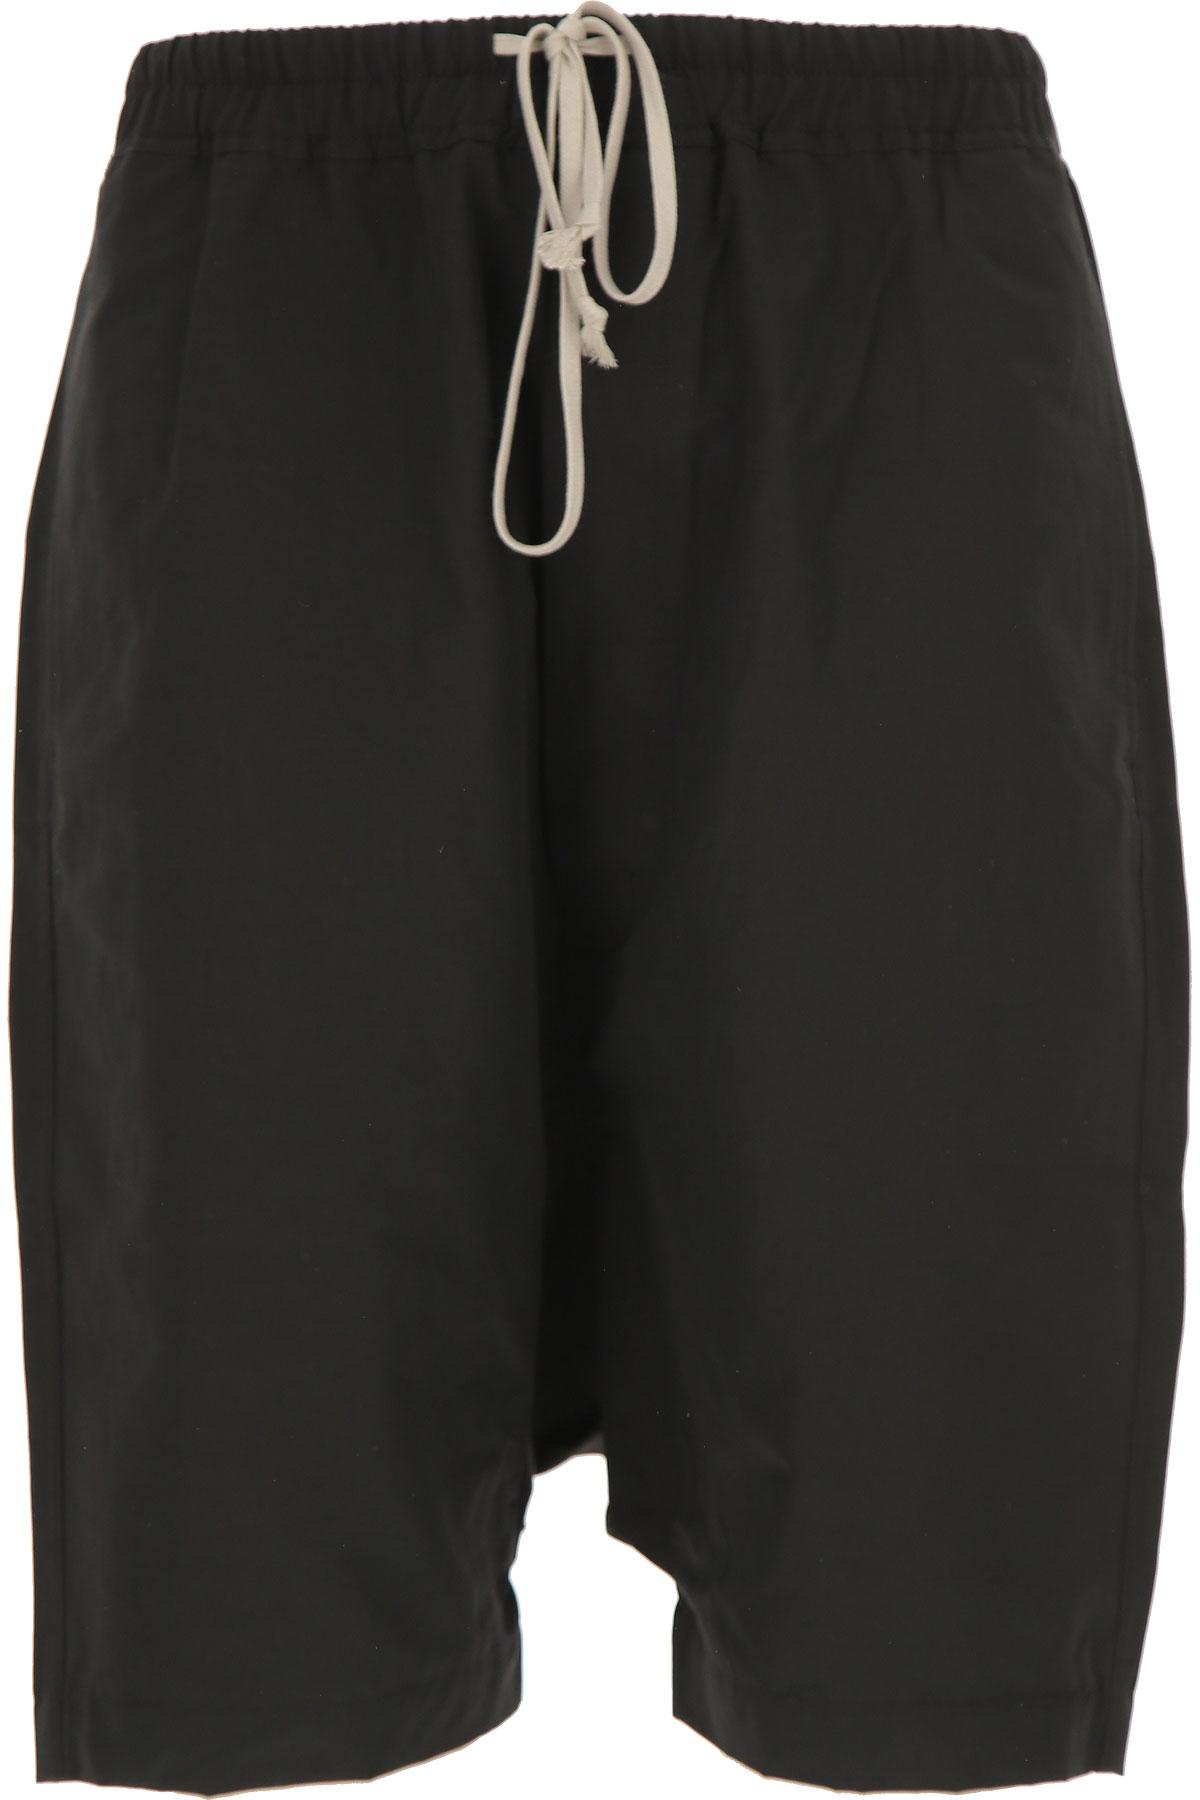 Rick Owens DRKSHDW Shorts for Men On Sale in Outlet, Black, Cotton, 2019, L (EU 50) M (EU 48)